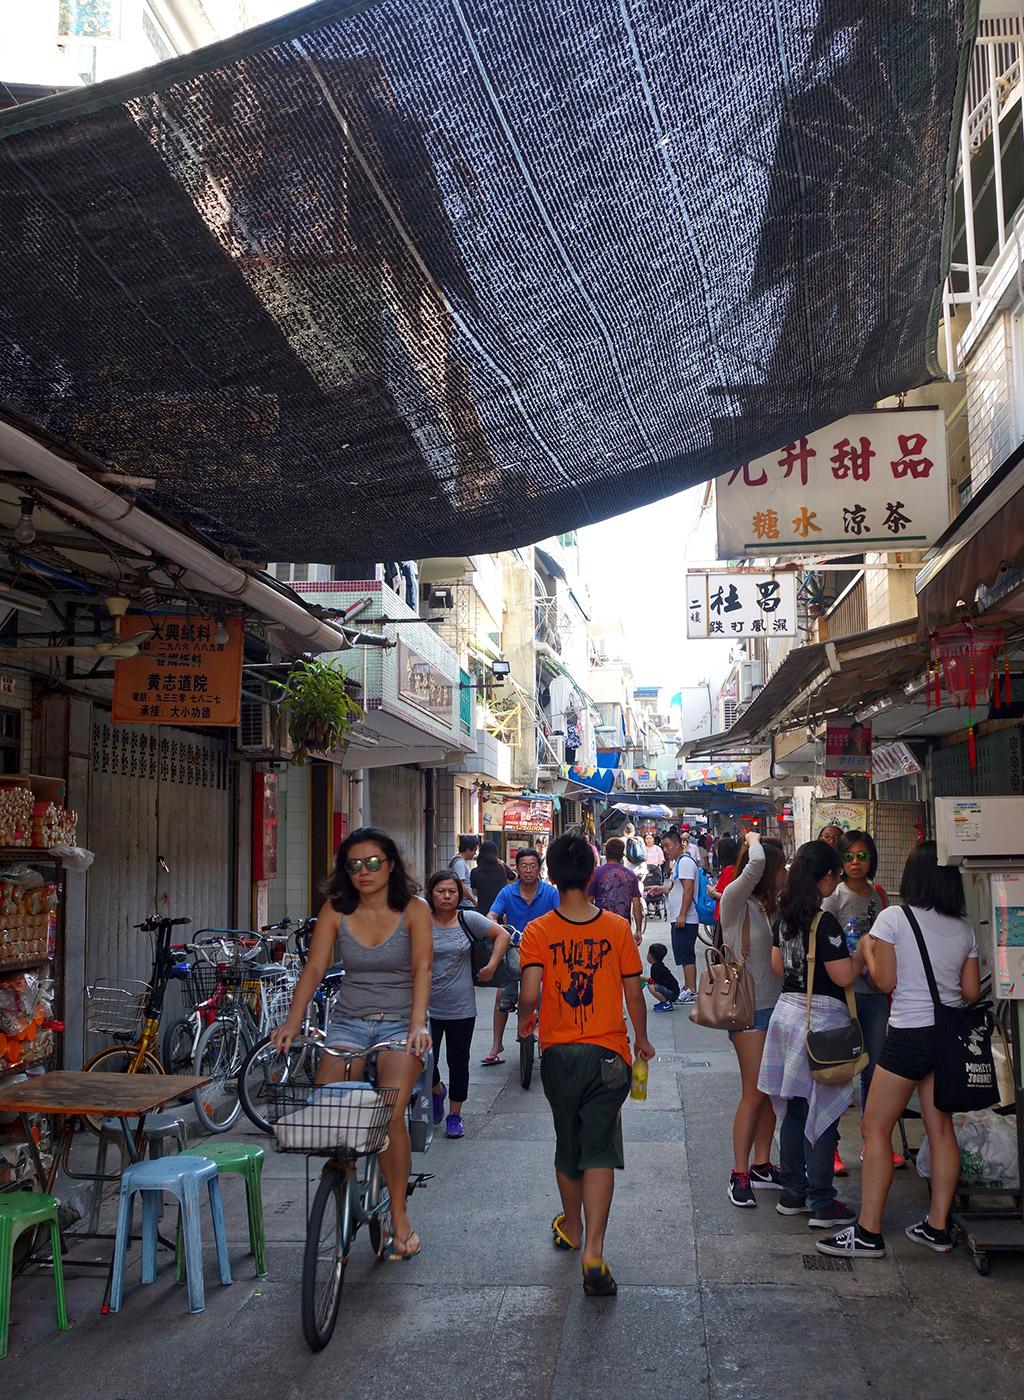 cheung-chau-hong-kong-day-trip-starting-with-a-17